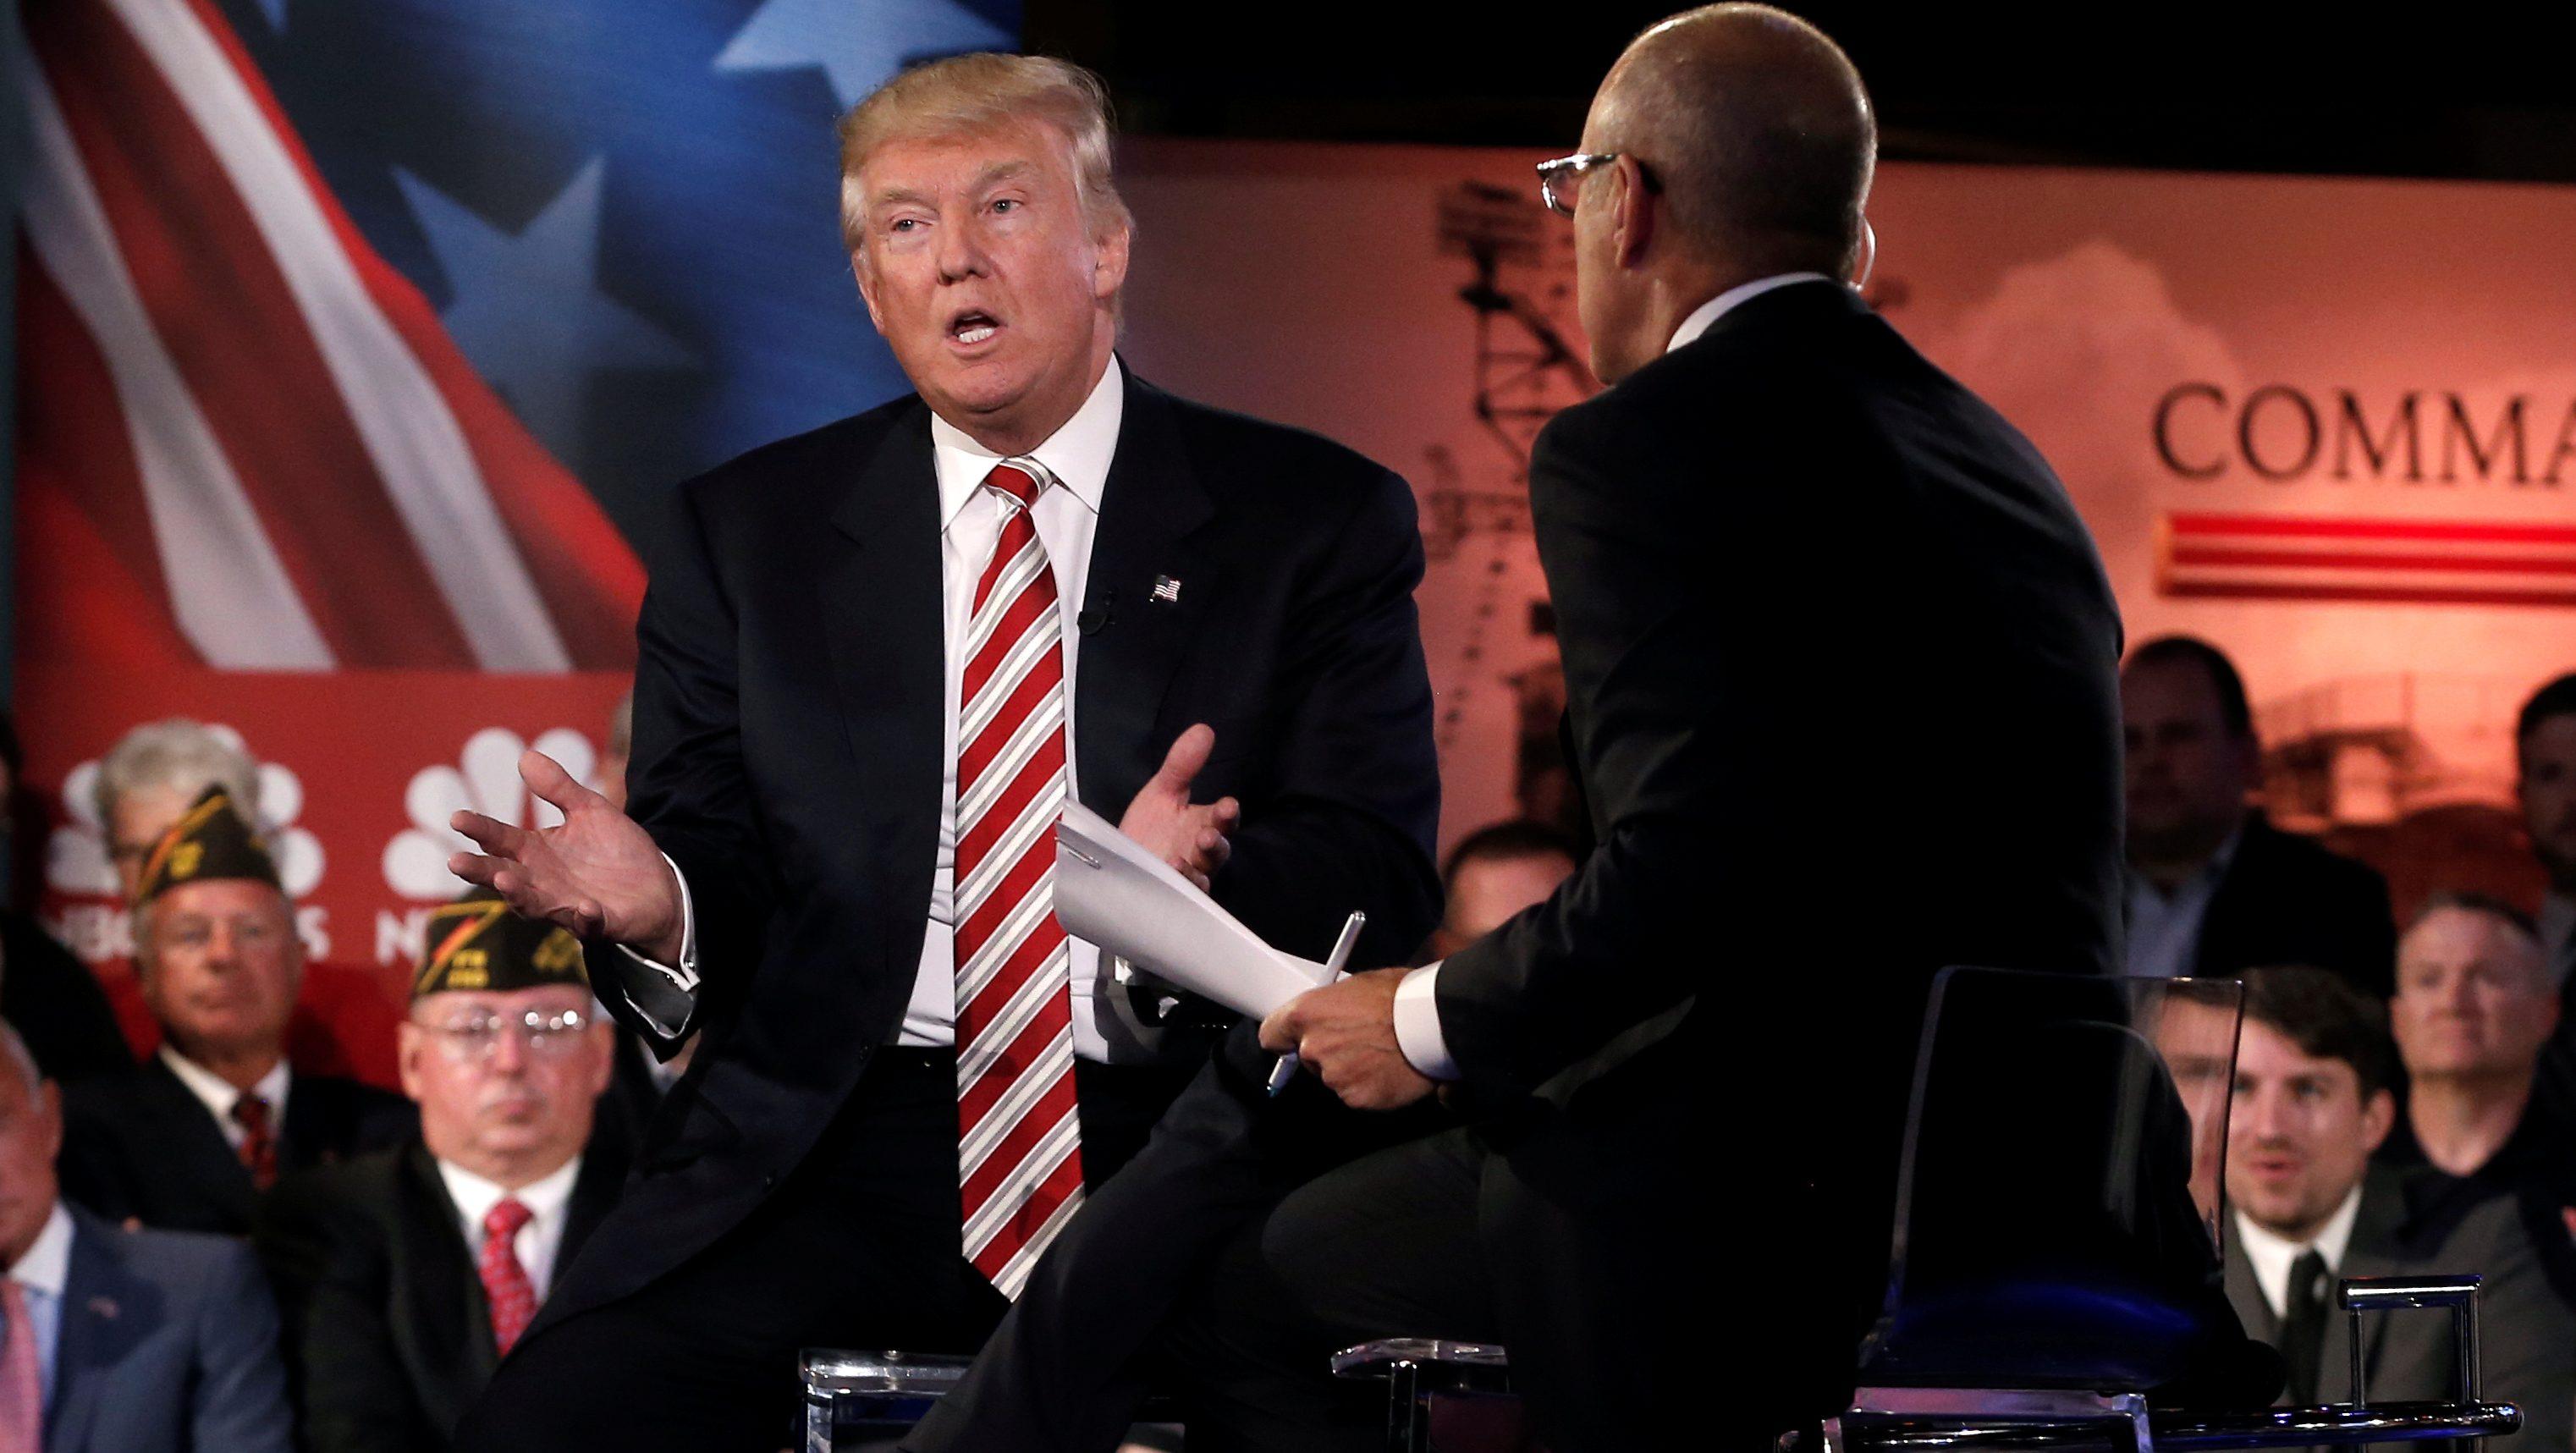 Republican presidential nominee Donald Trump speaks during the Commander in Chief Forum in Manhattan, New York, U.S., September 7, 2016.  REUTERS/Mike Segar - S1AEUAAKHIAA